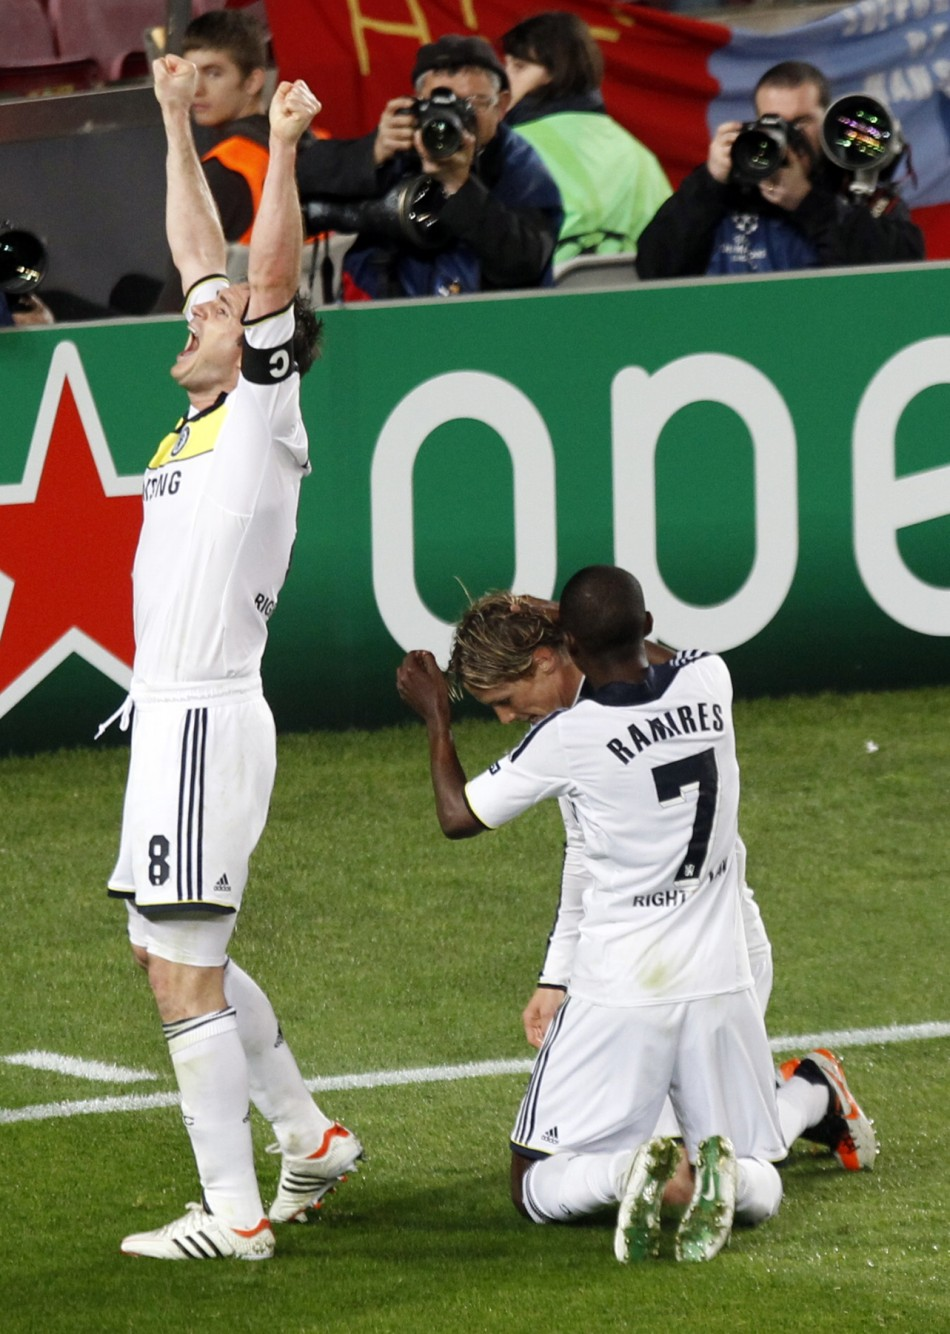 Frank Lampard, Fernando Torres and Ramires